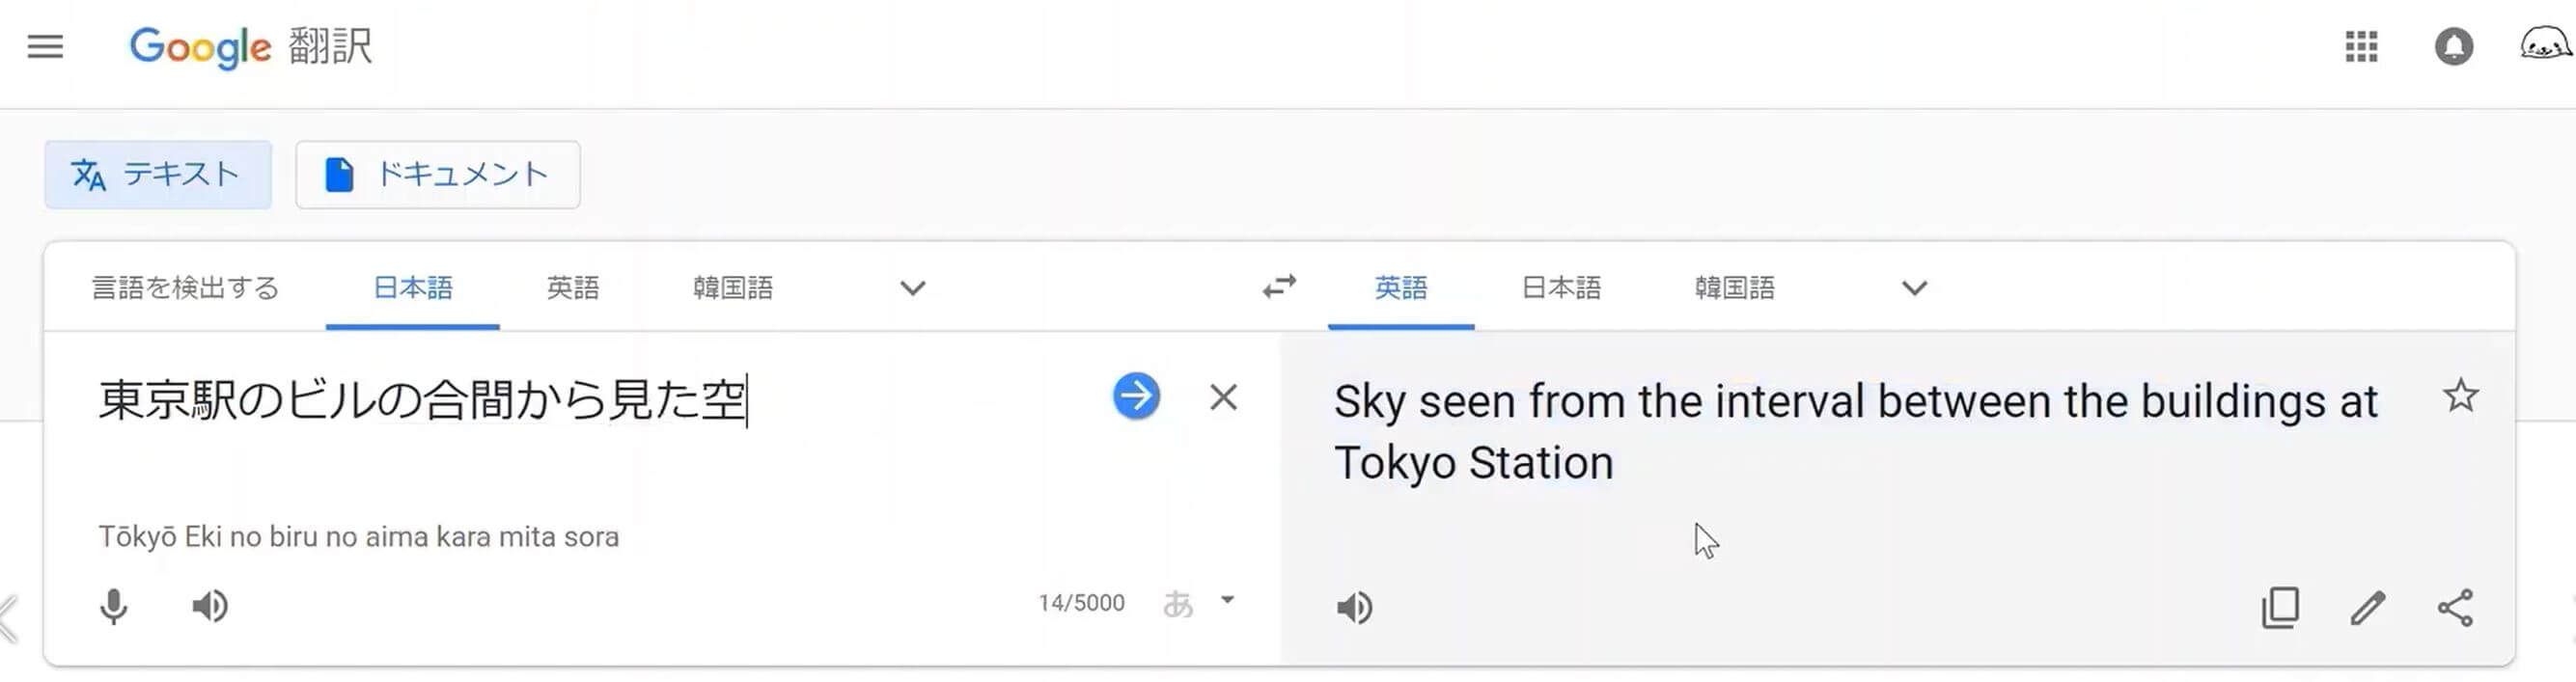 Google翻訳でタイトル